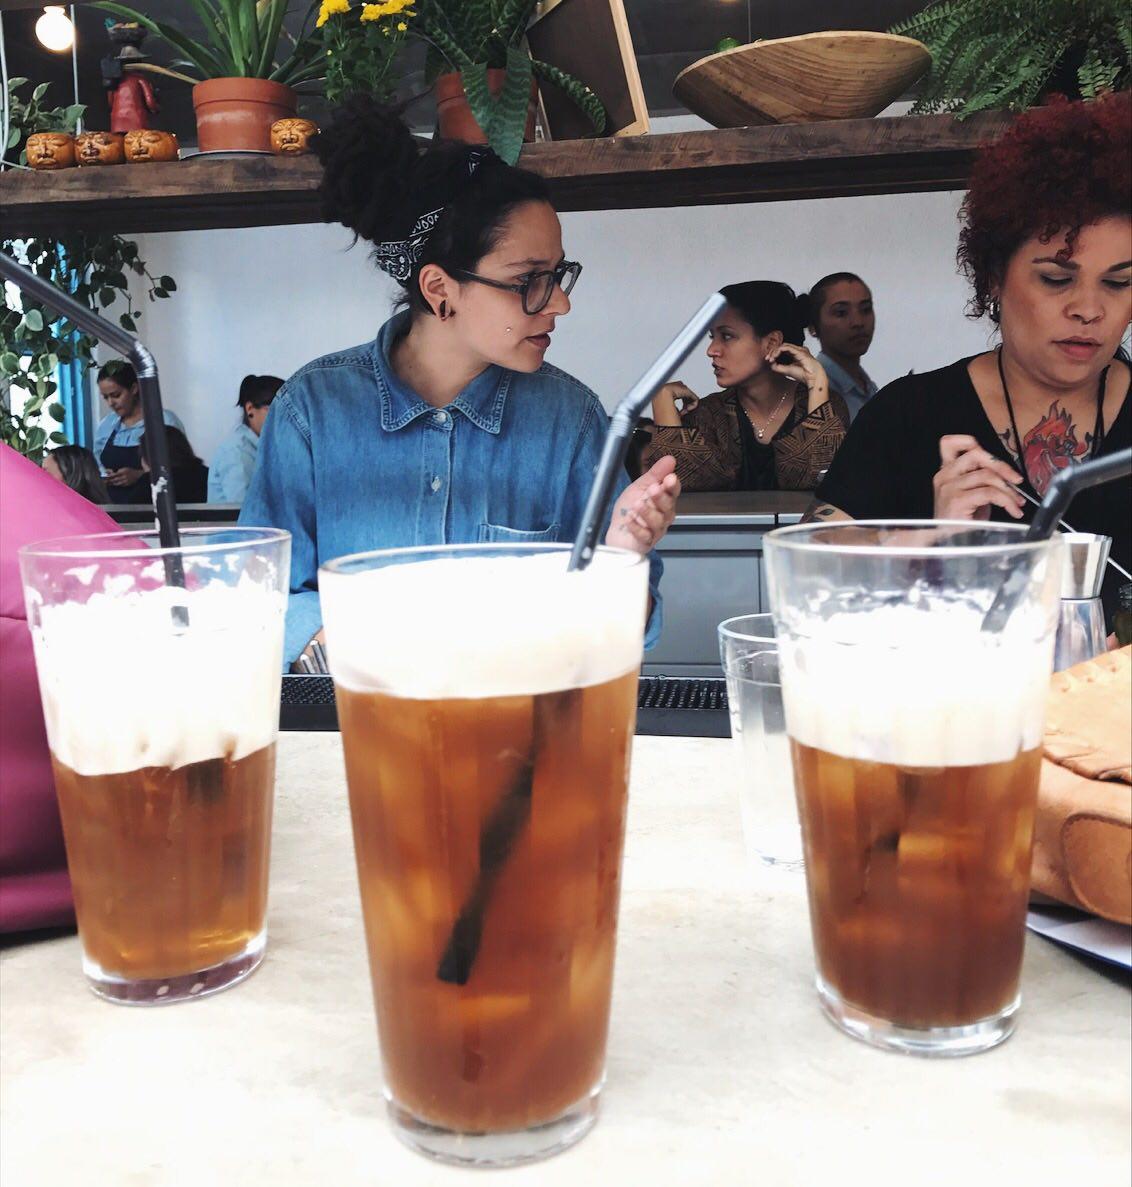 Fito restaurante sao paulo eusouatoa mate gelado